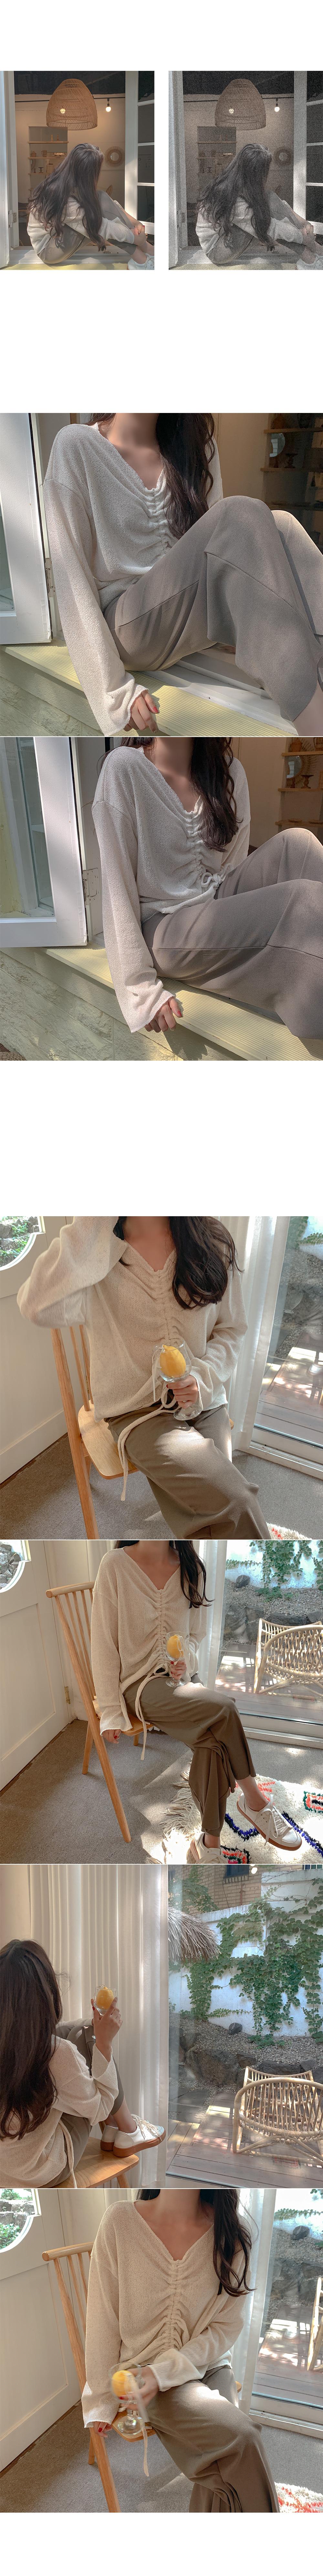 Imitation bookstring knit